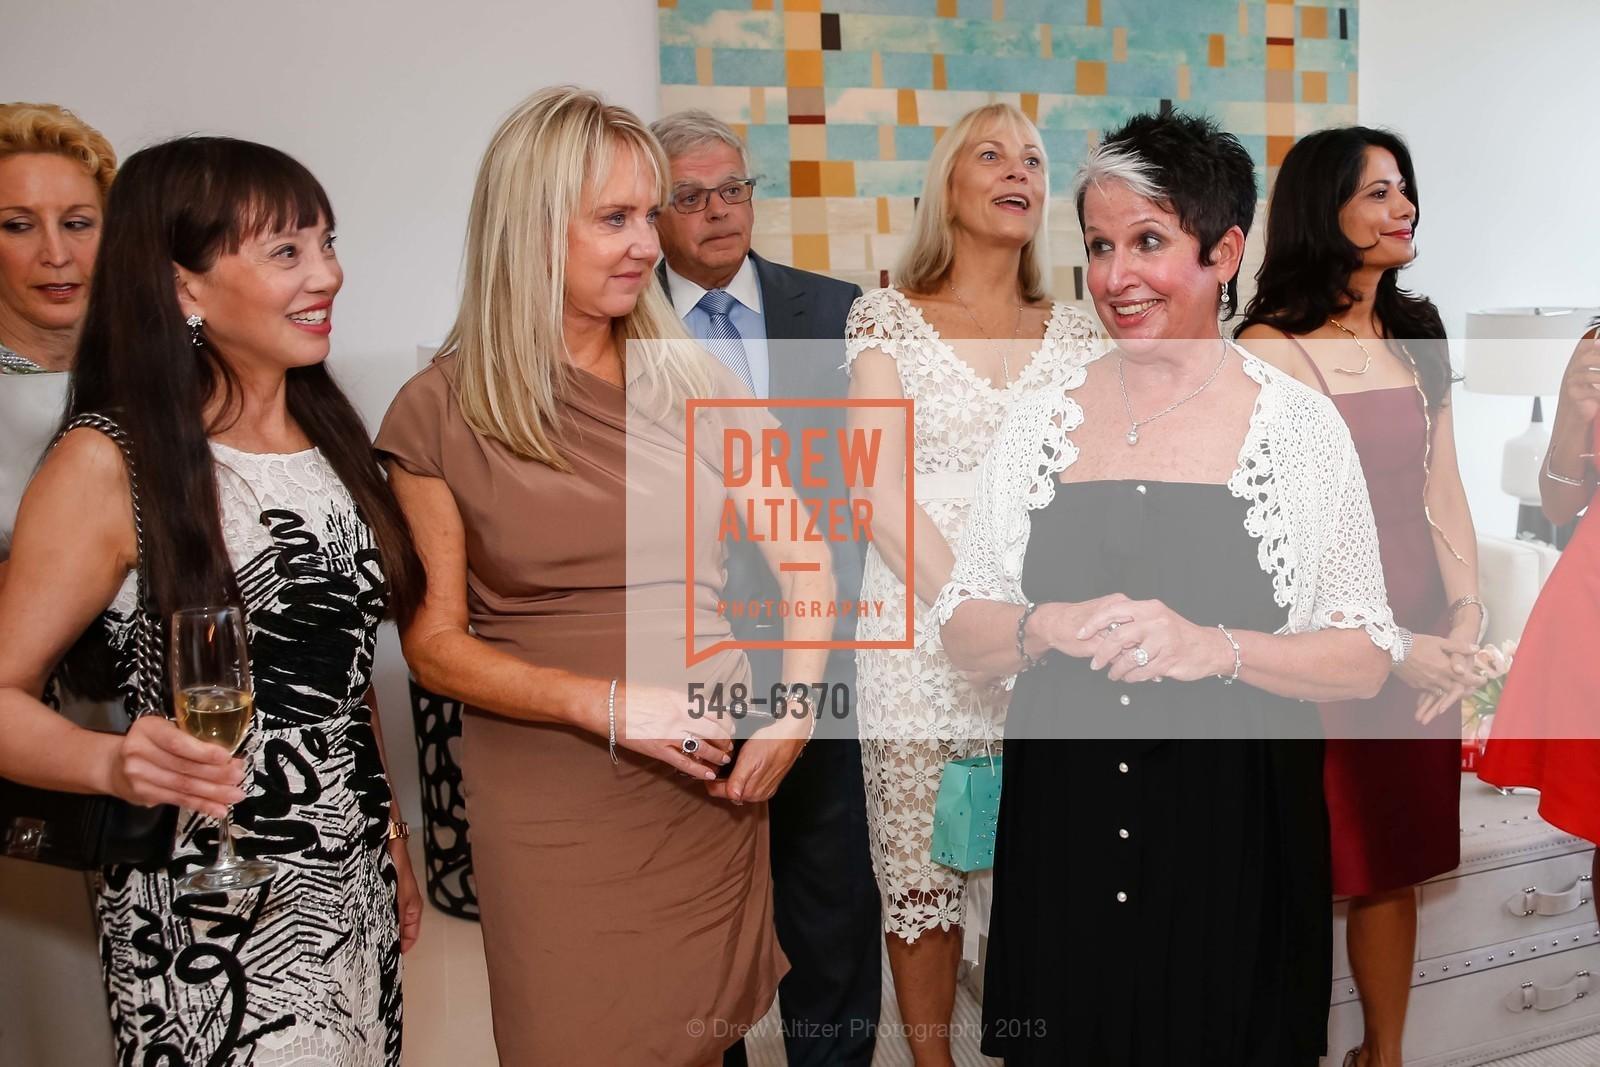 France Szeto, Carolyn Stuart, Karen Kubin, OPERA GALA Patrons Party, US, August 28th, 2013